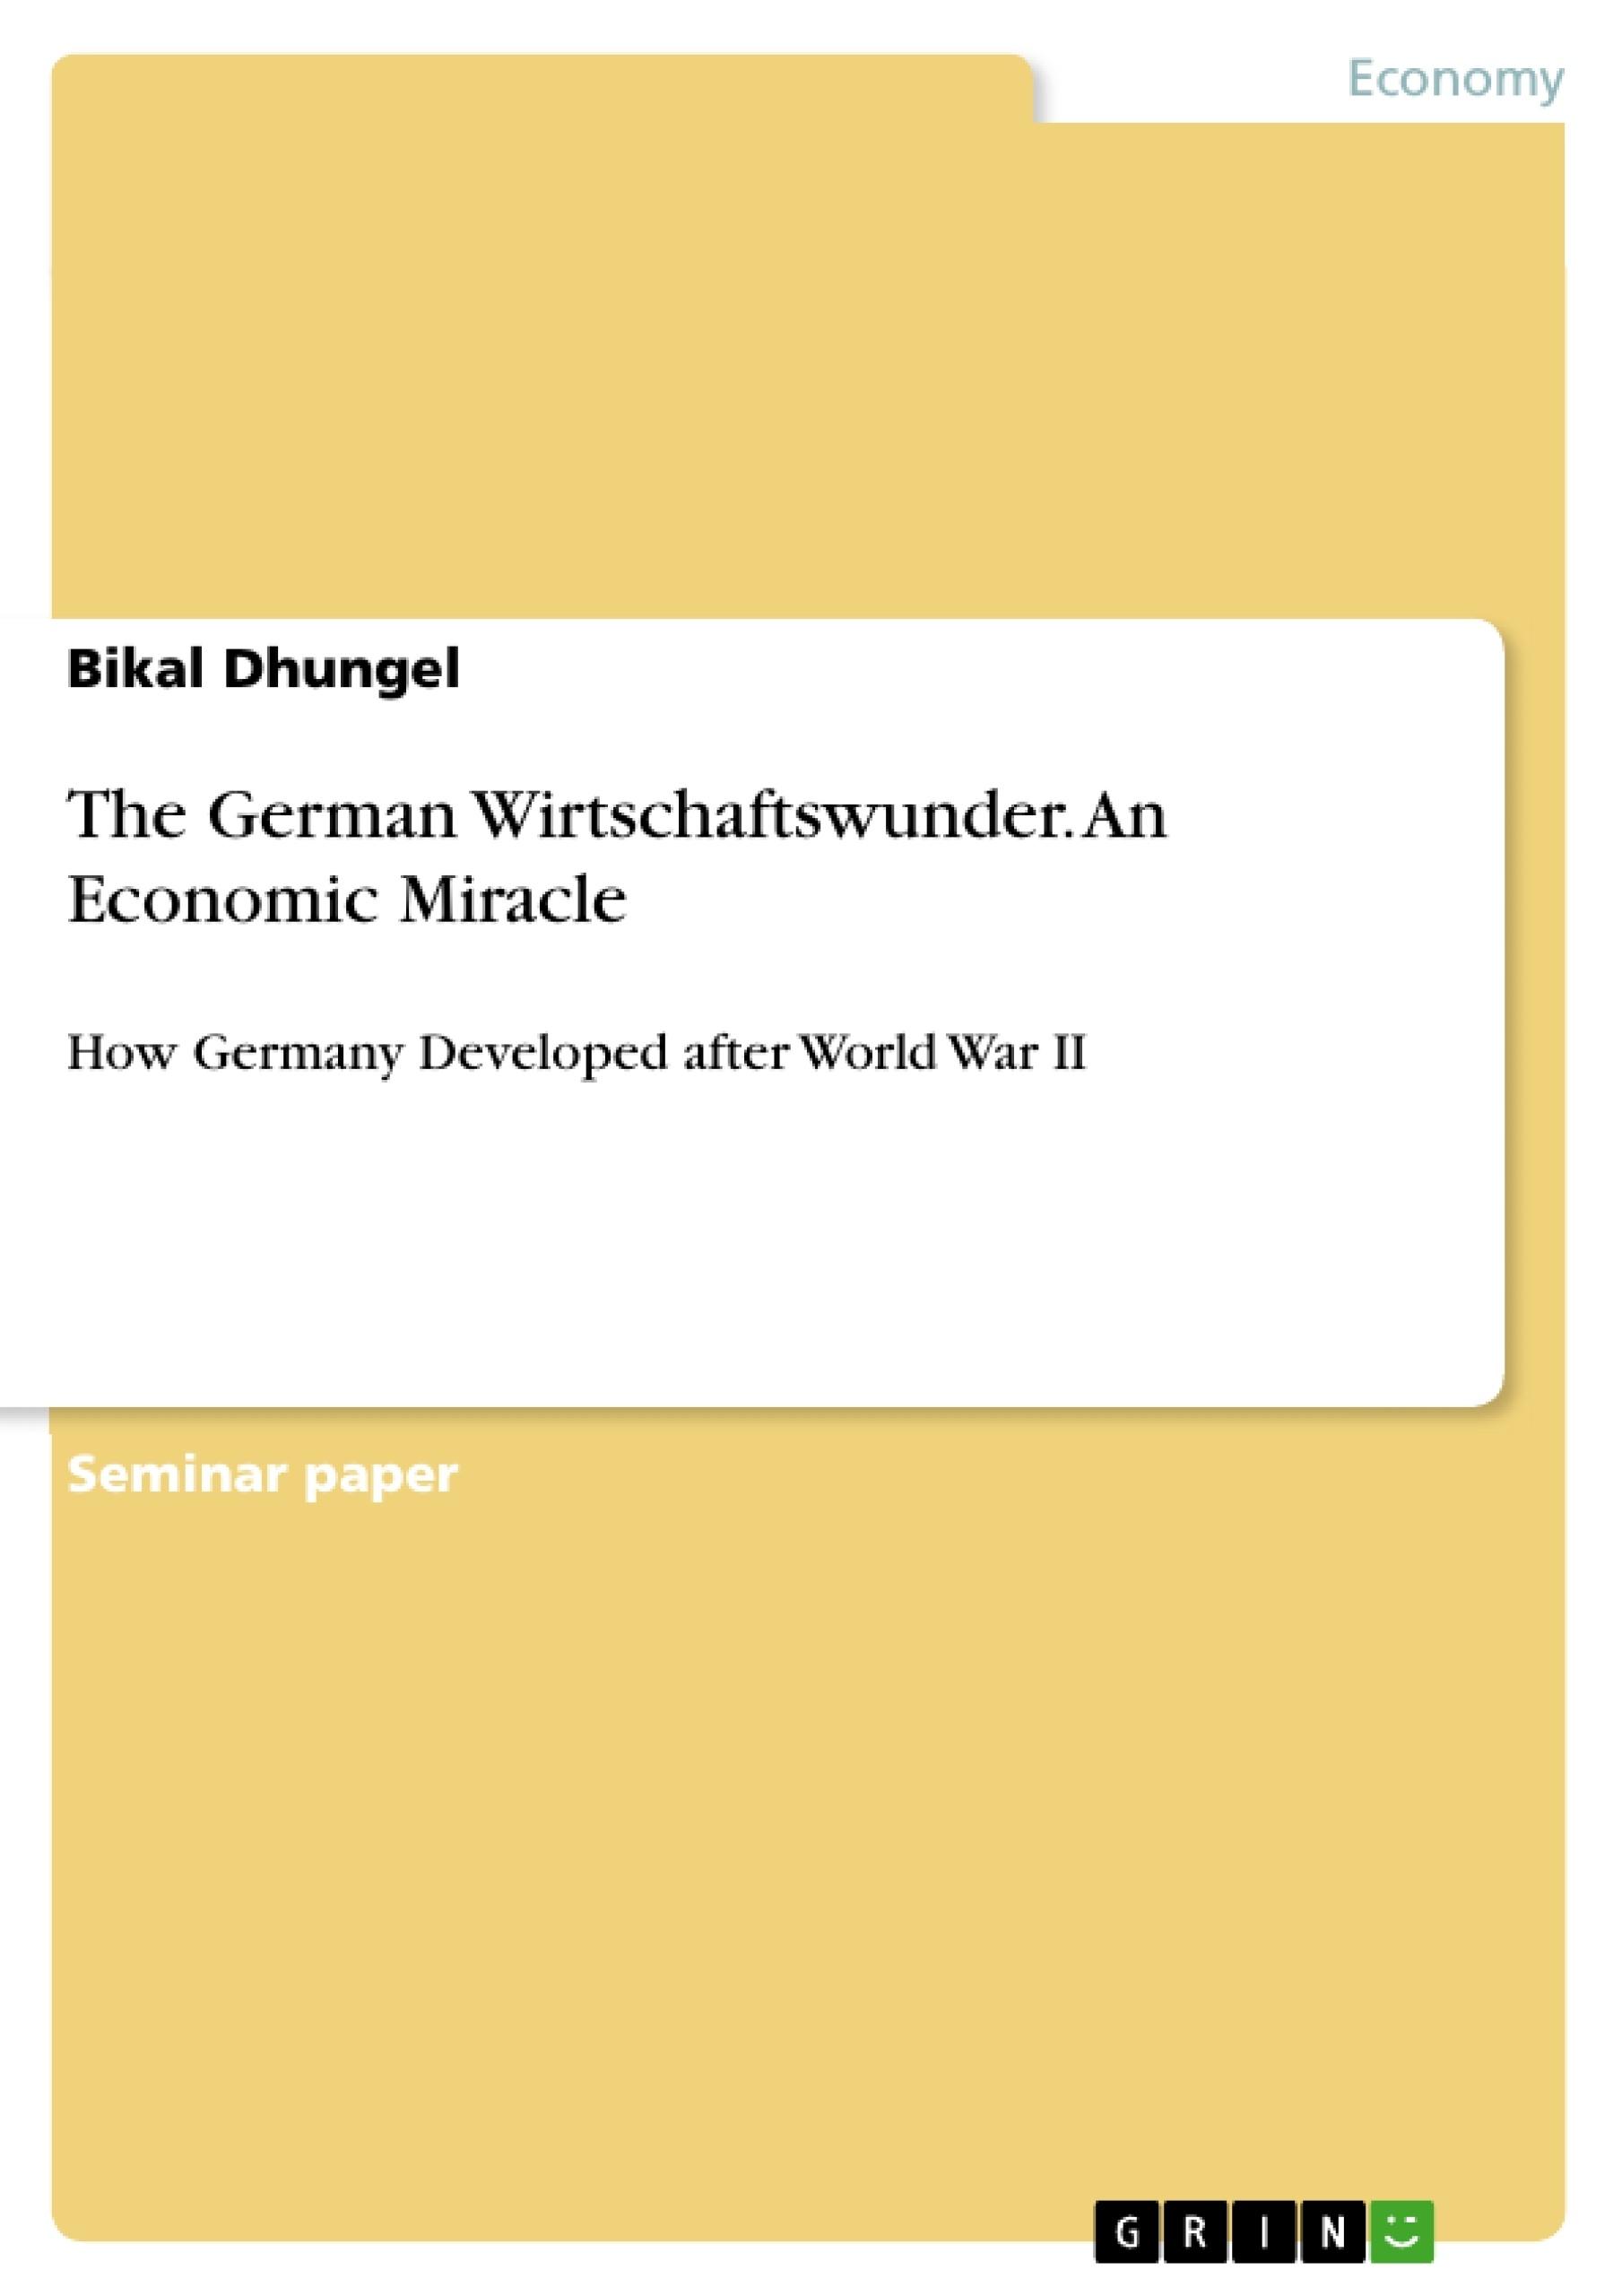 Title: The German Wirtschaftswunder. An Economic Miracle